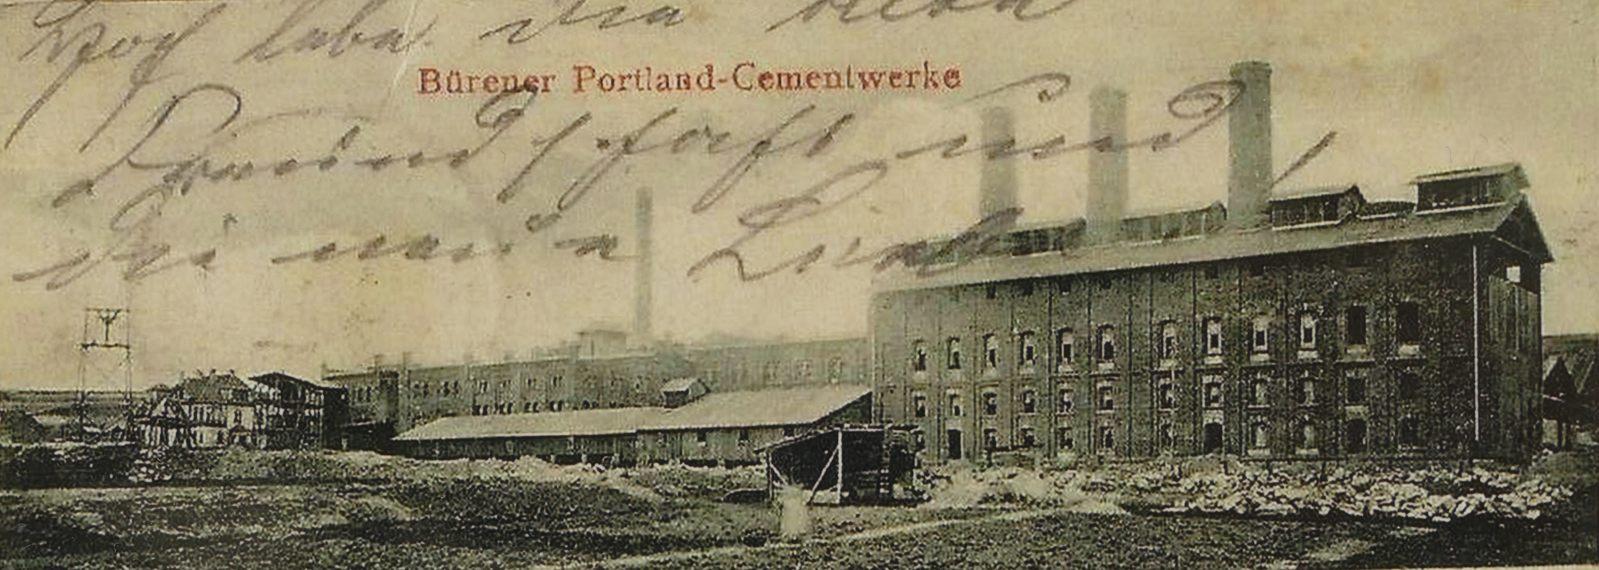 Burania Portland Cementwerke 1901